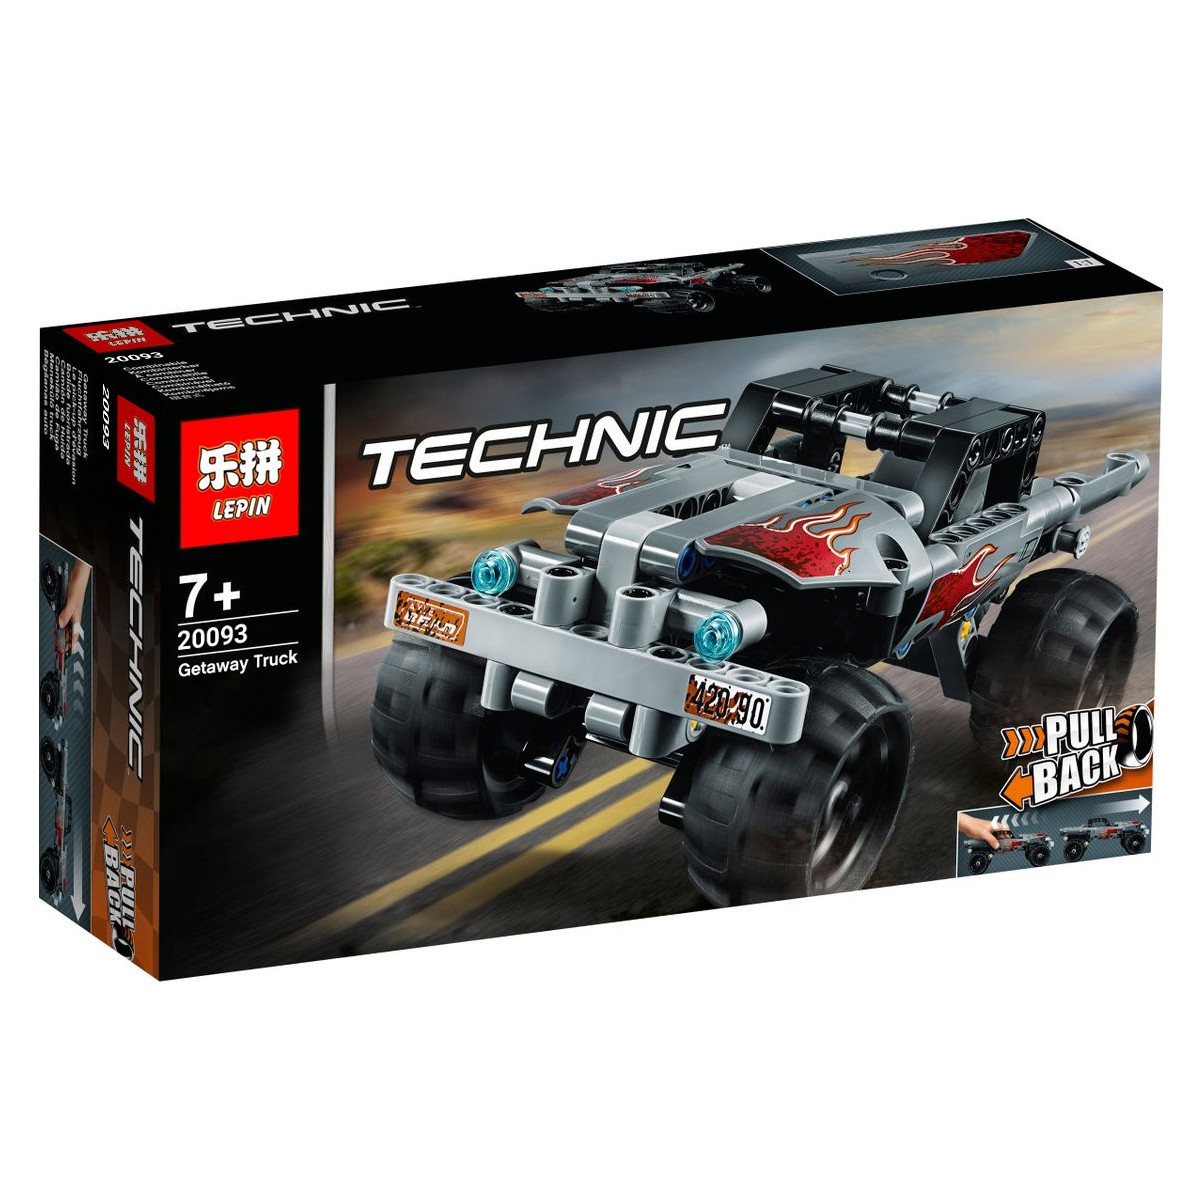 "Конструктор Lepin 20093 ""Машина для побега"" (реплика Lego Technic 42090), 144 дет"